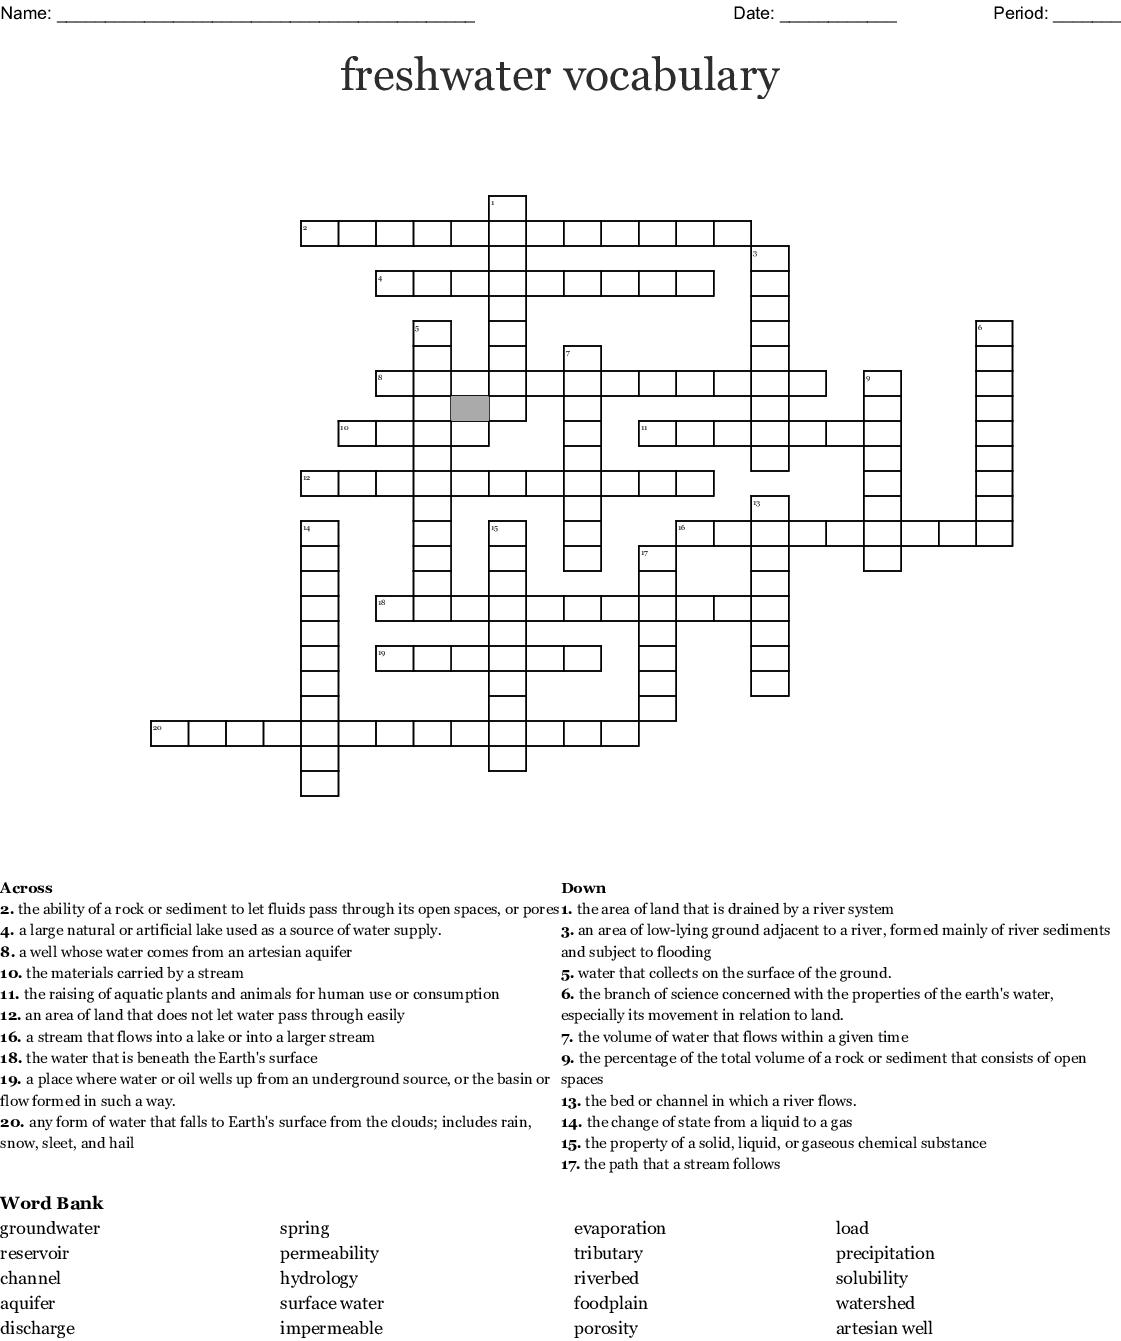 Freshwater Vocabulary Crossword